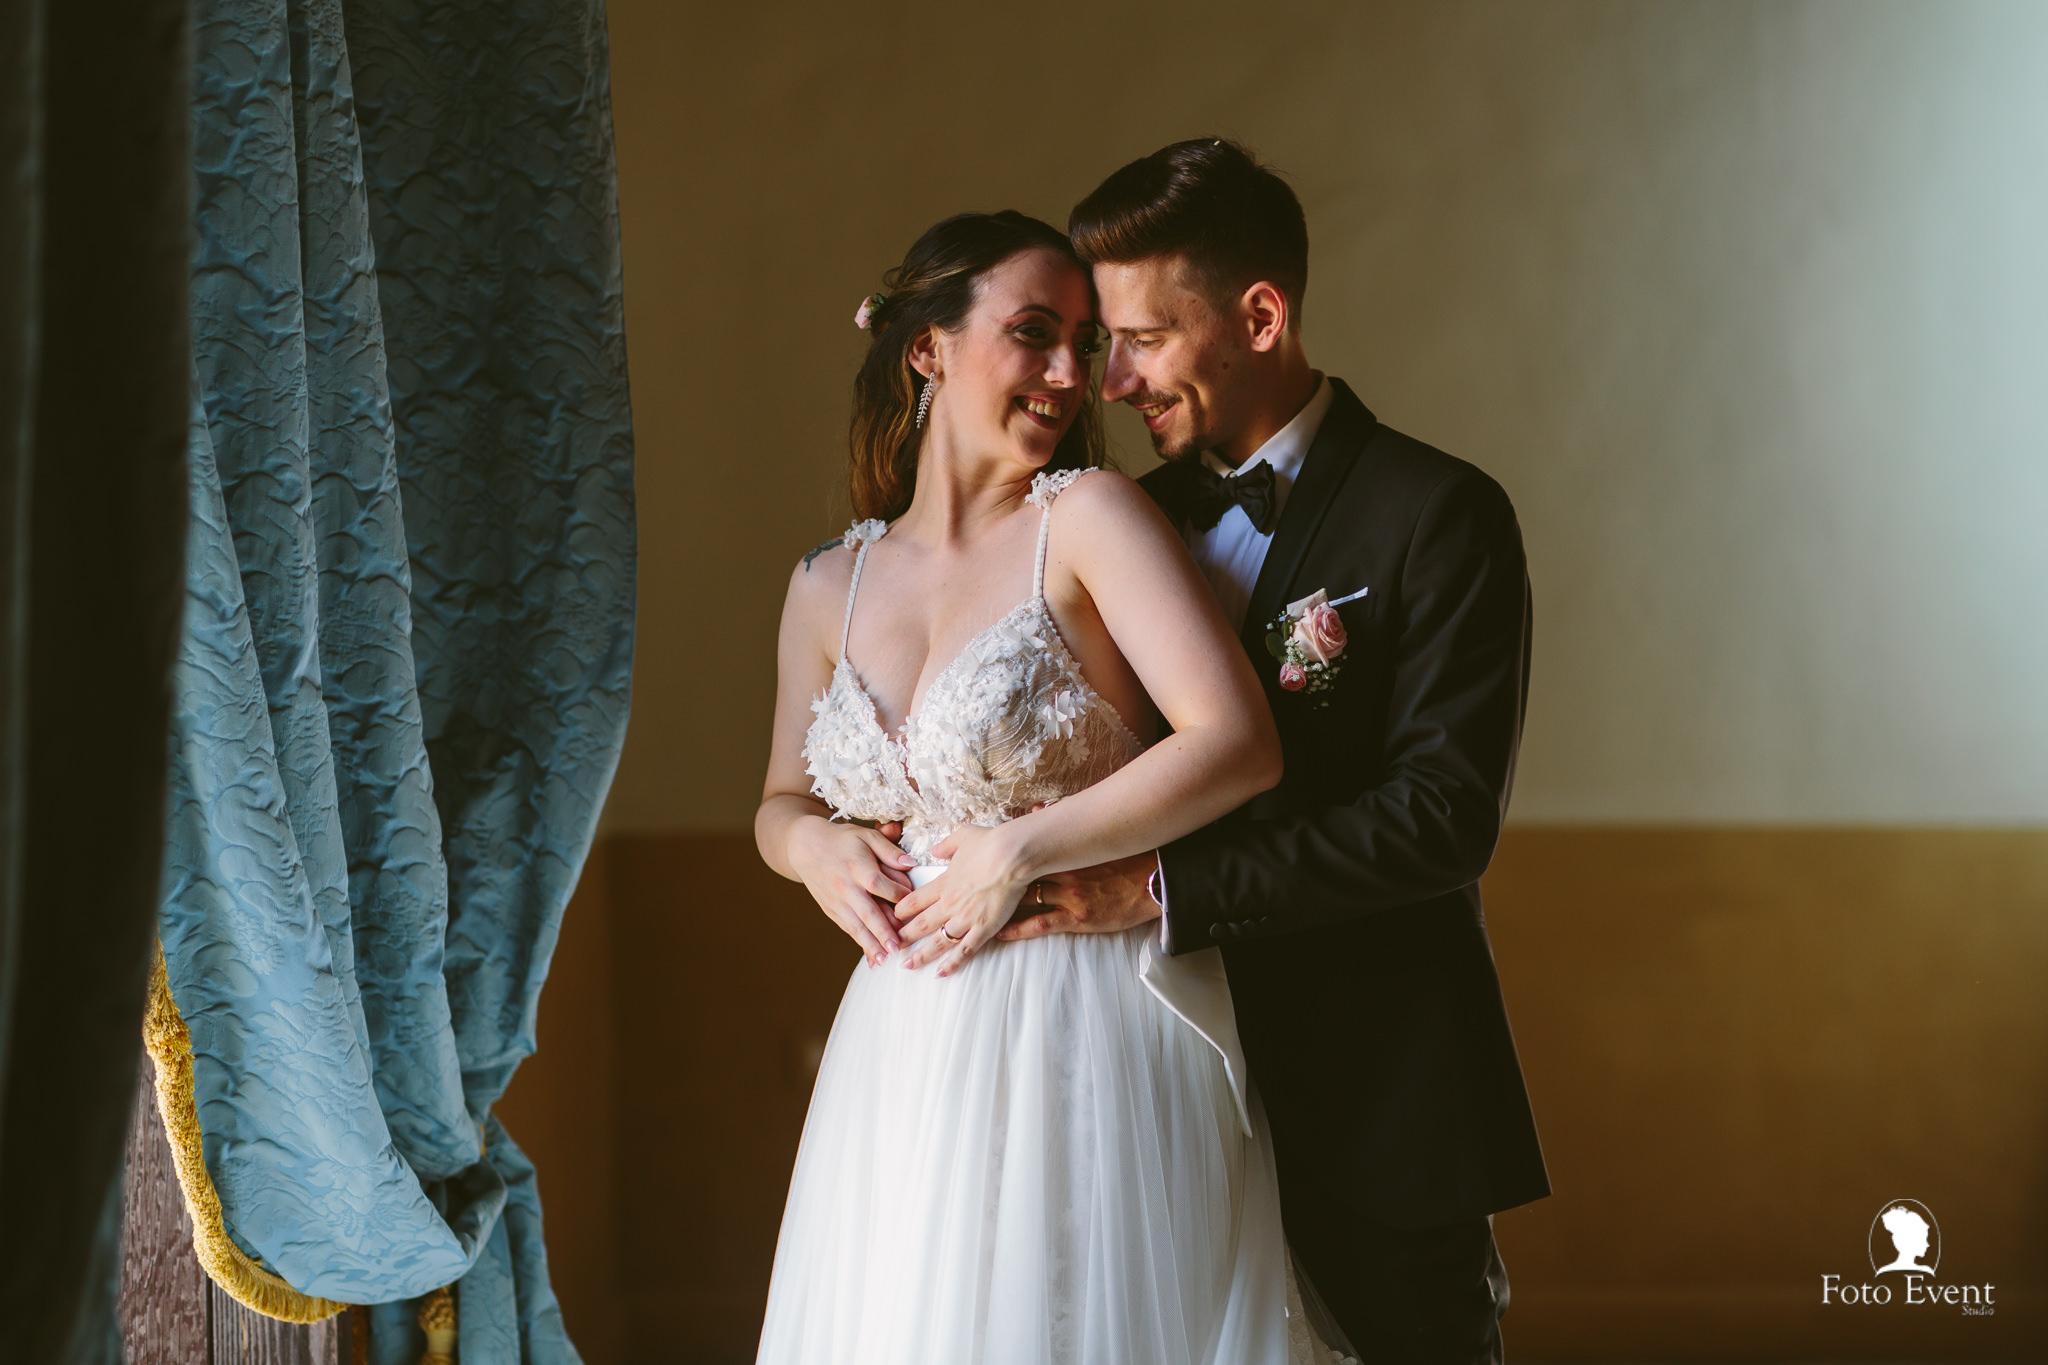 043-2019-08-22-Matrimonio-Angela-e-Nicola-Iaconis-Ric1-349